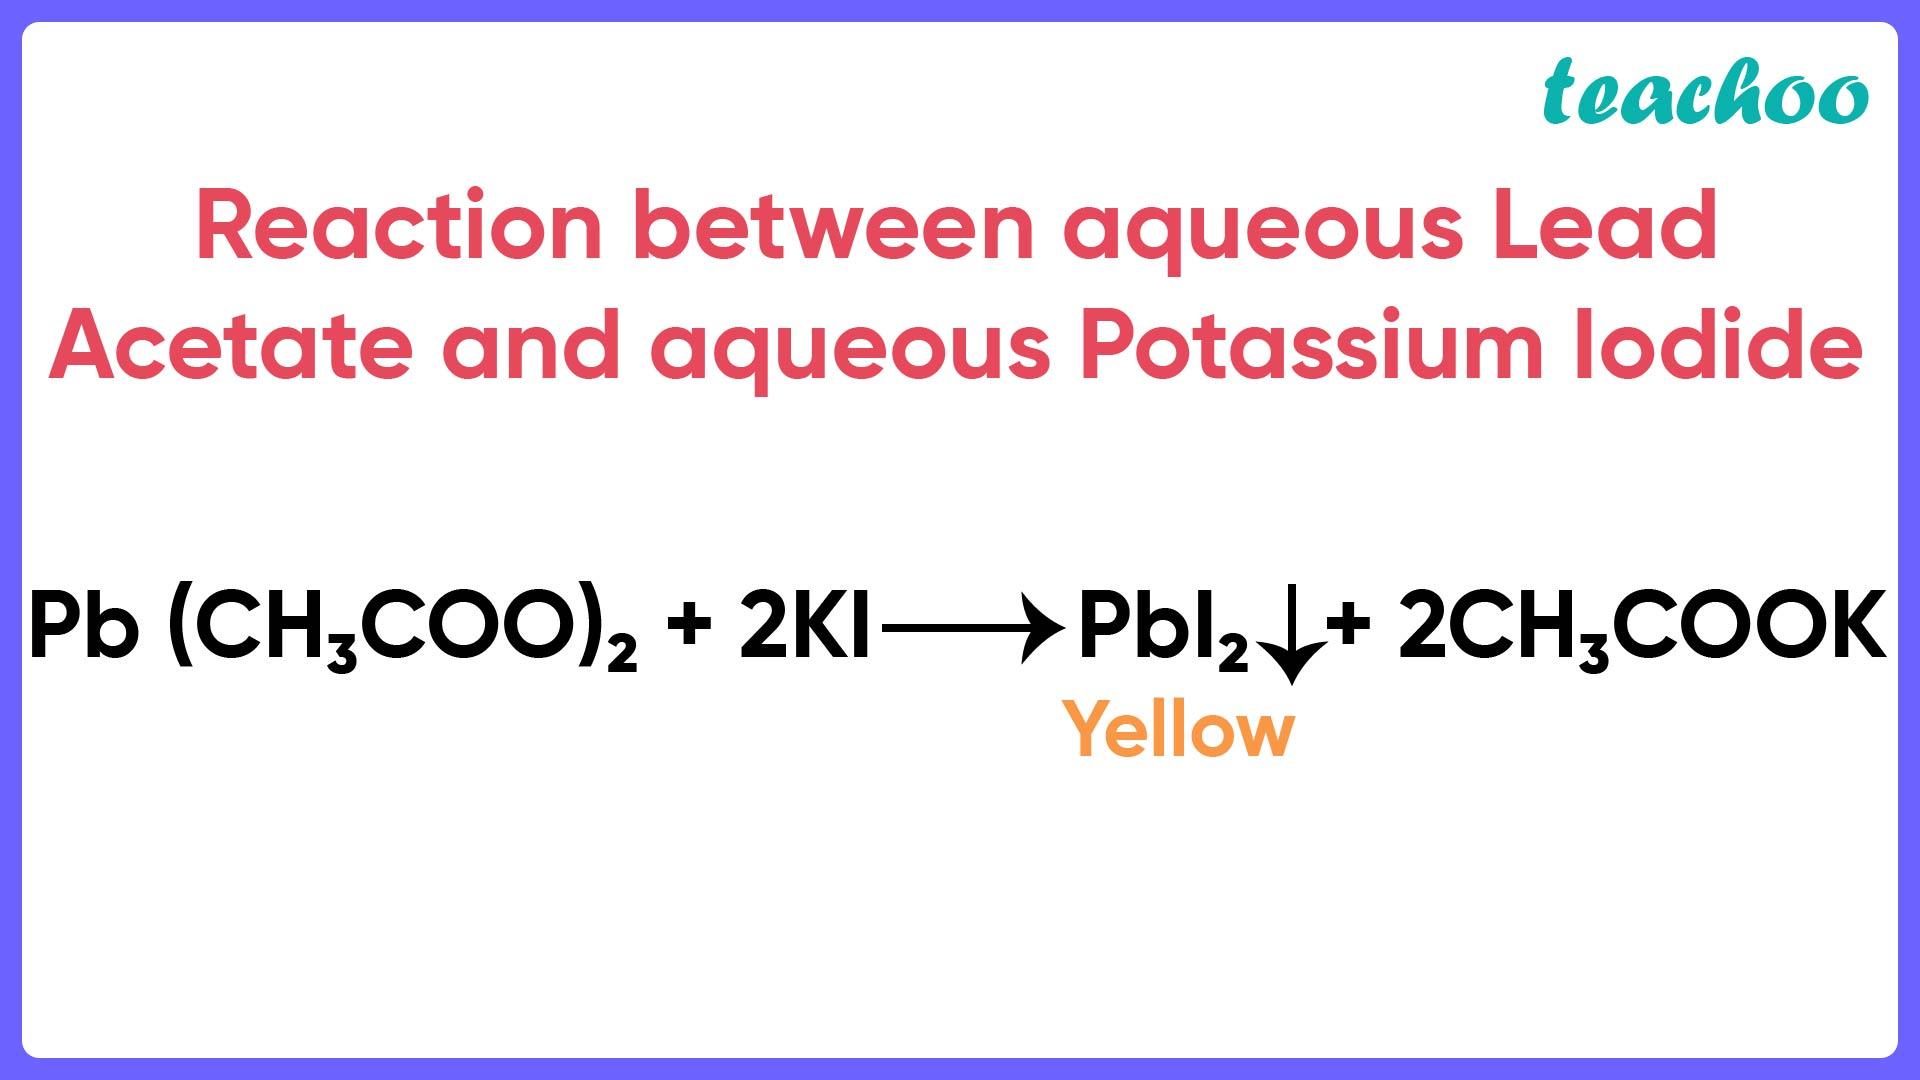 Reaction between aqueous Lead Acetate and aqueous Potassium Iodide  - Teachoo.jpg